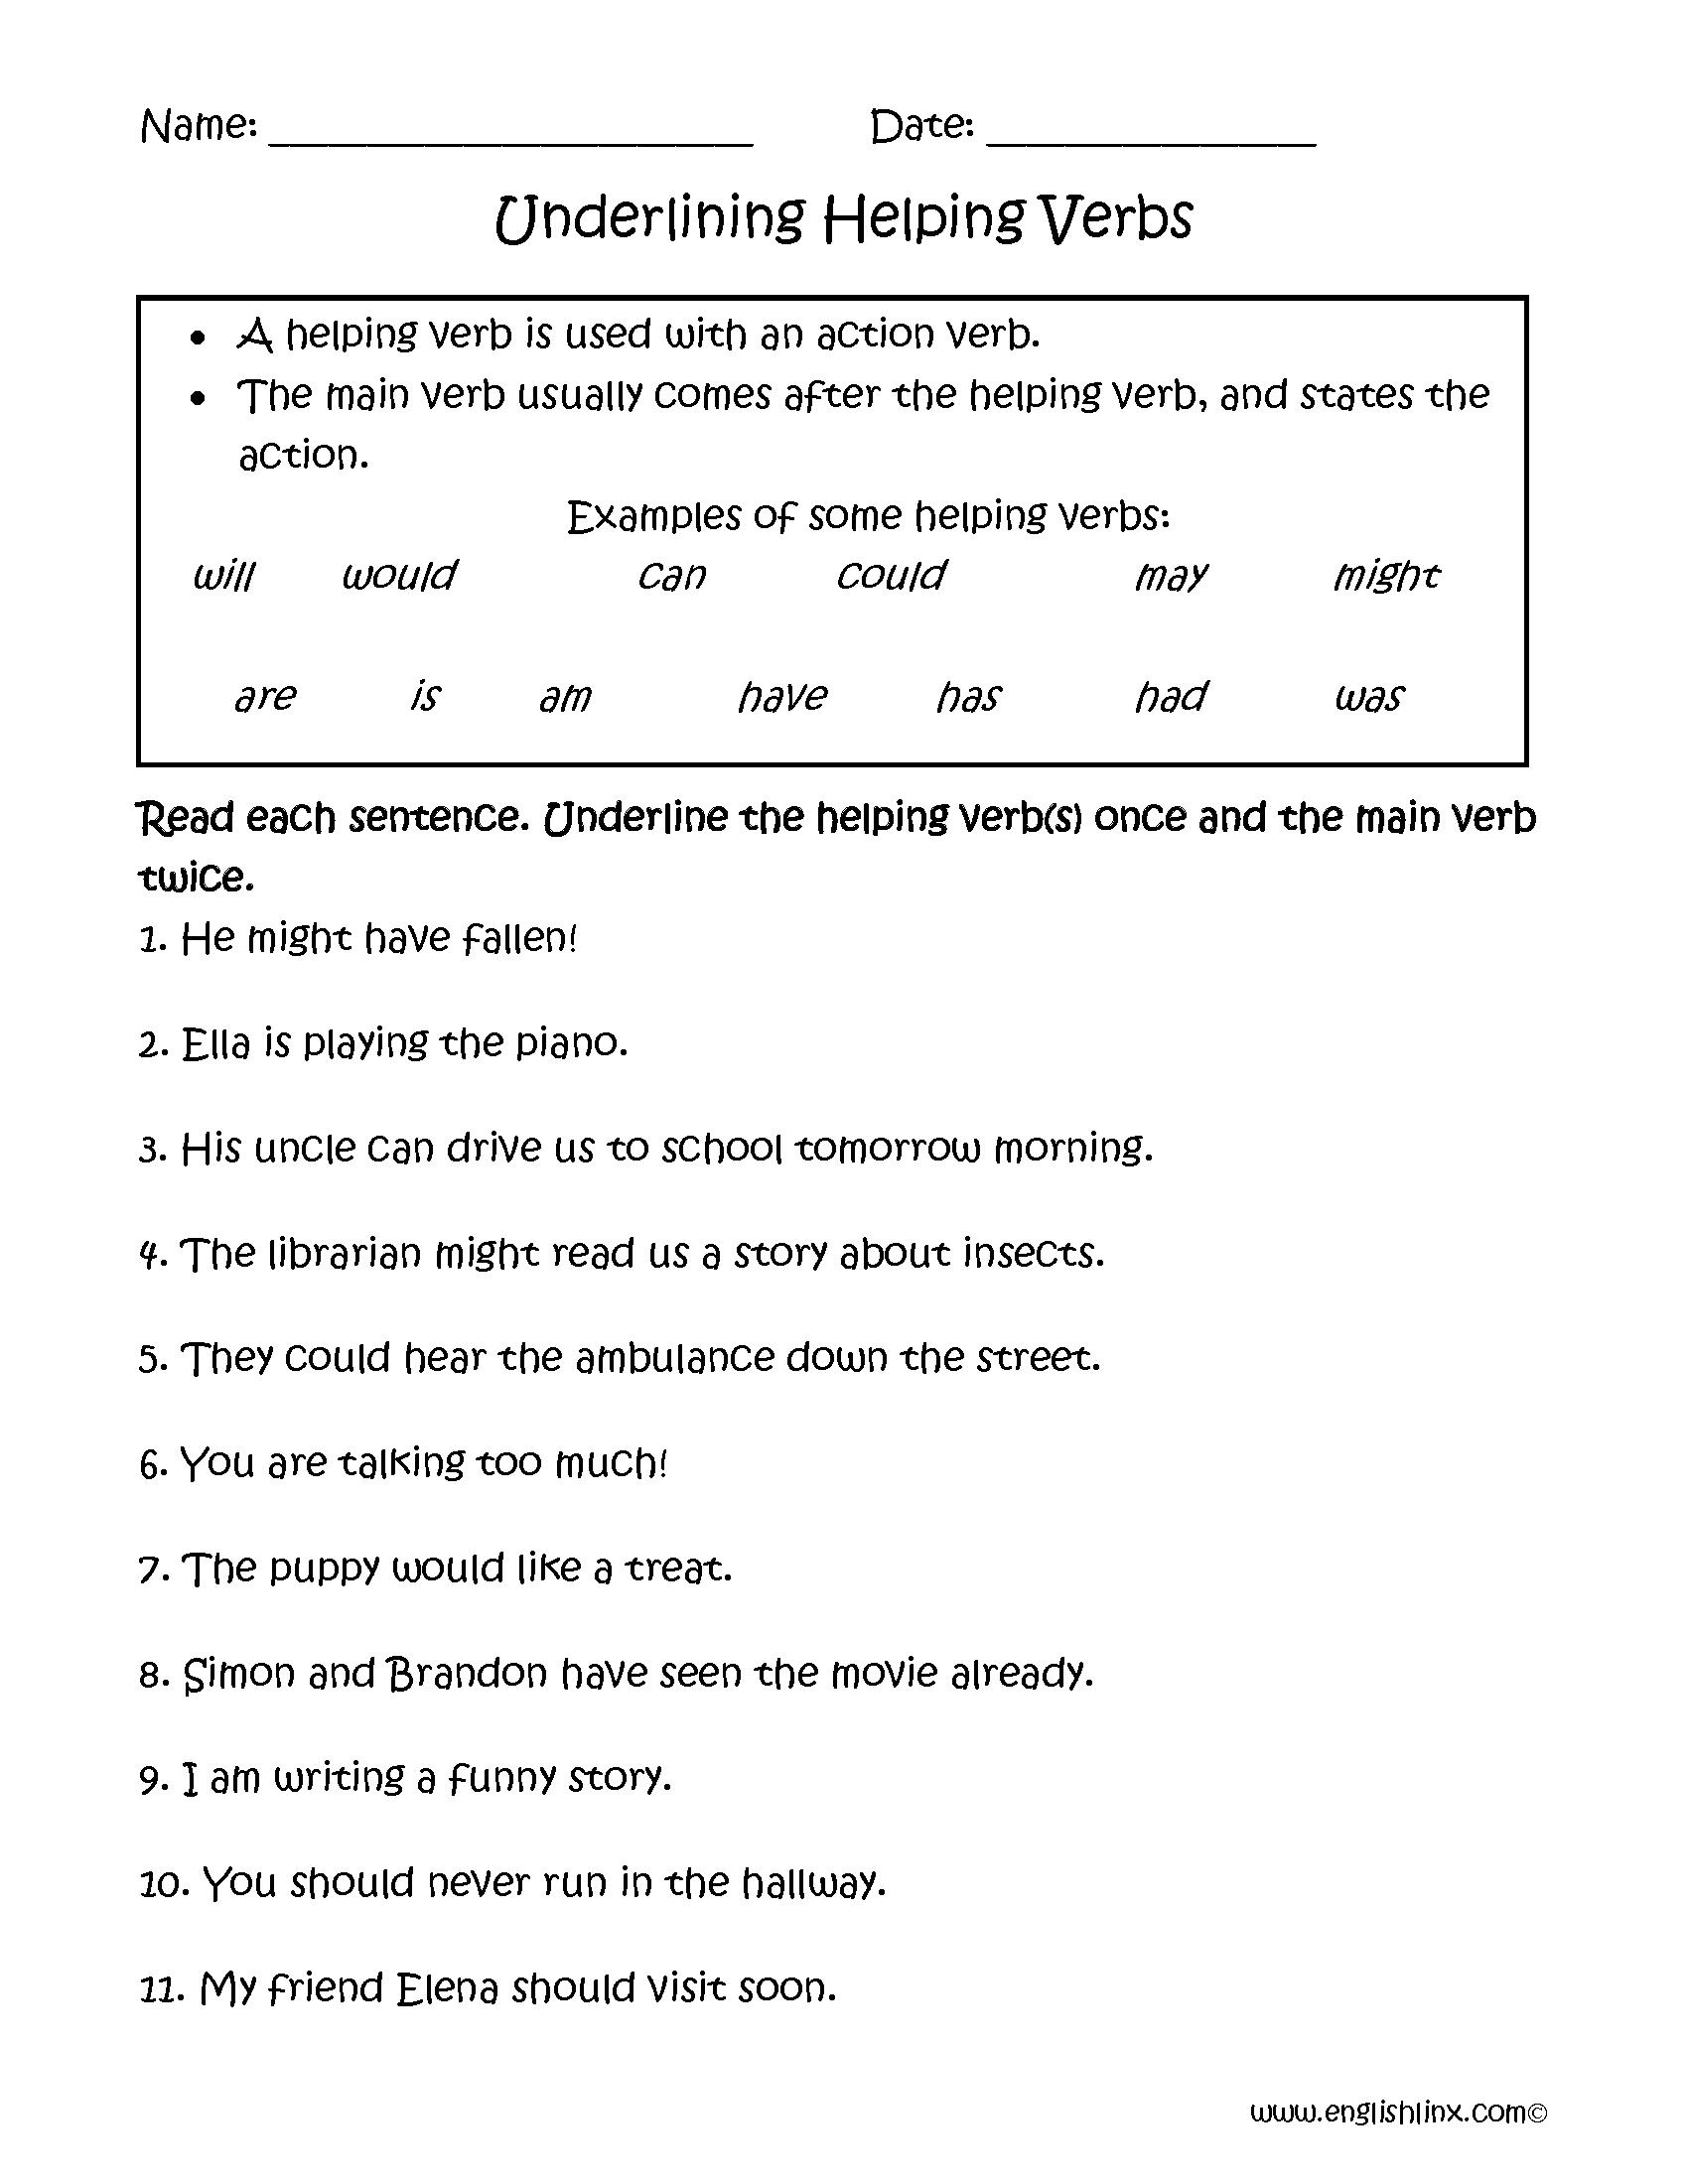 underlining helping verbs worksheets teaching language reading verb worksheets linking. Black Bedroom Furniture Sets. Home Design Ideas